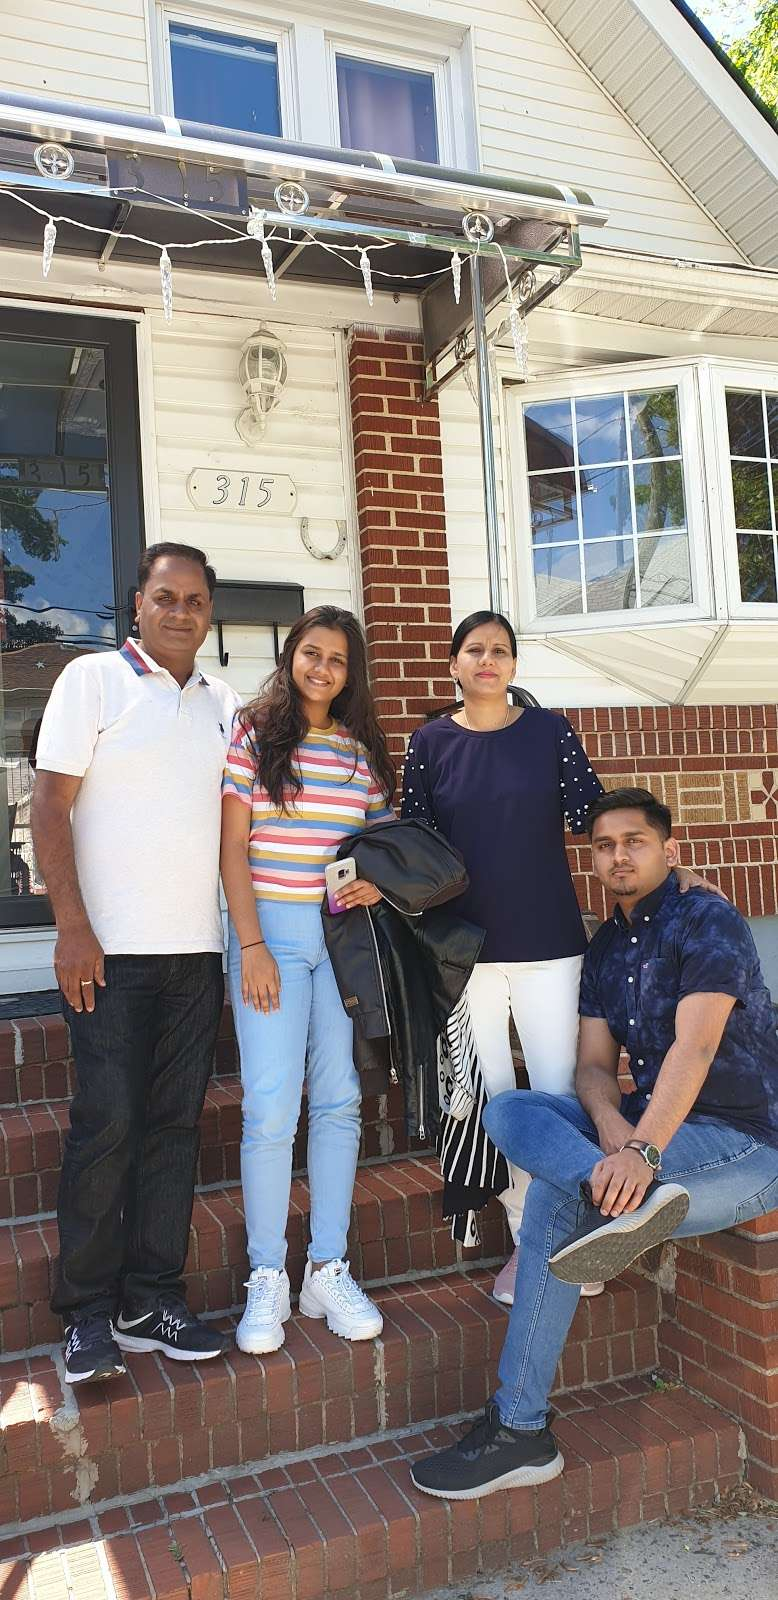 Gotham Avenue School -   | Photo 5 of 6 | Address: 181 Gotham Ave, Elmont, NY 11003, USA | Phone: (516) 326-5540